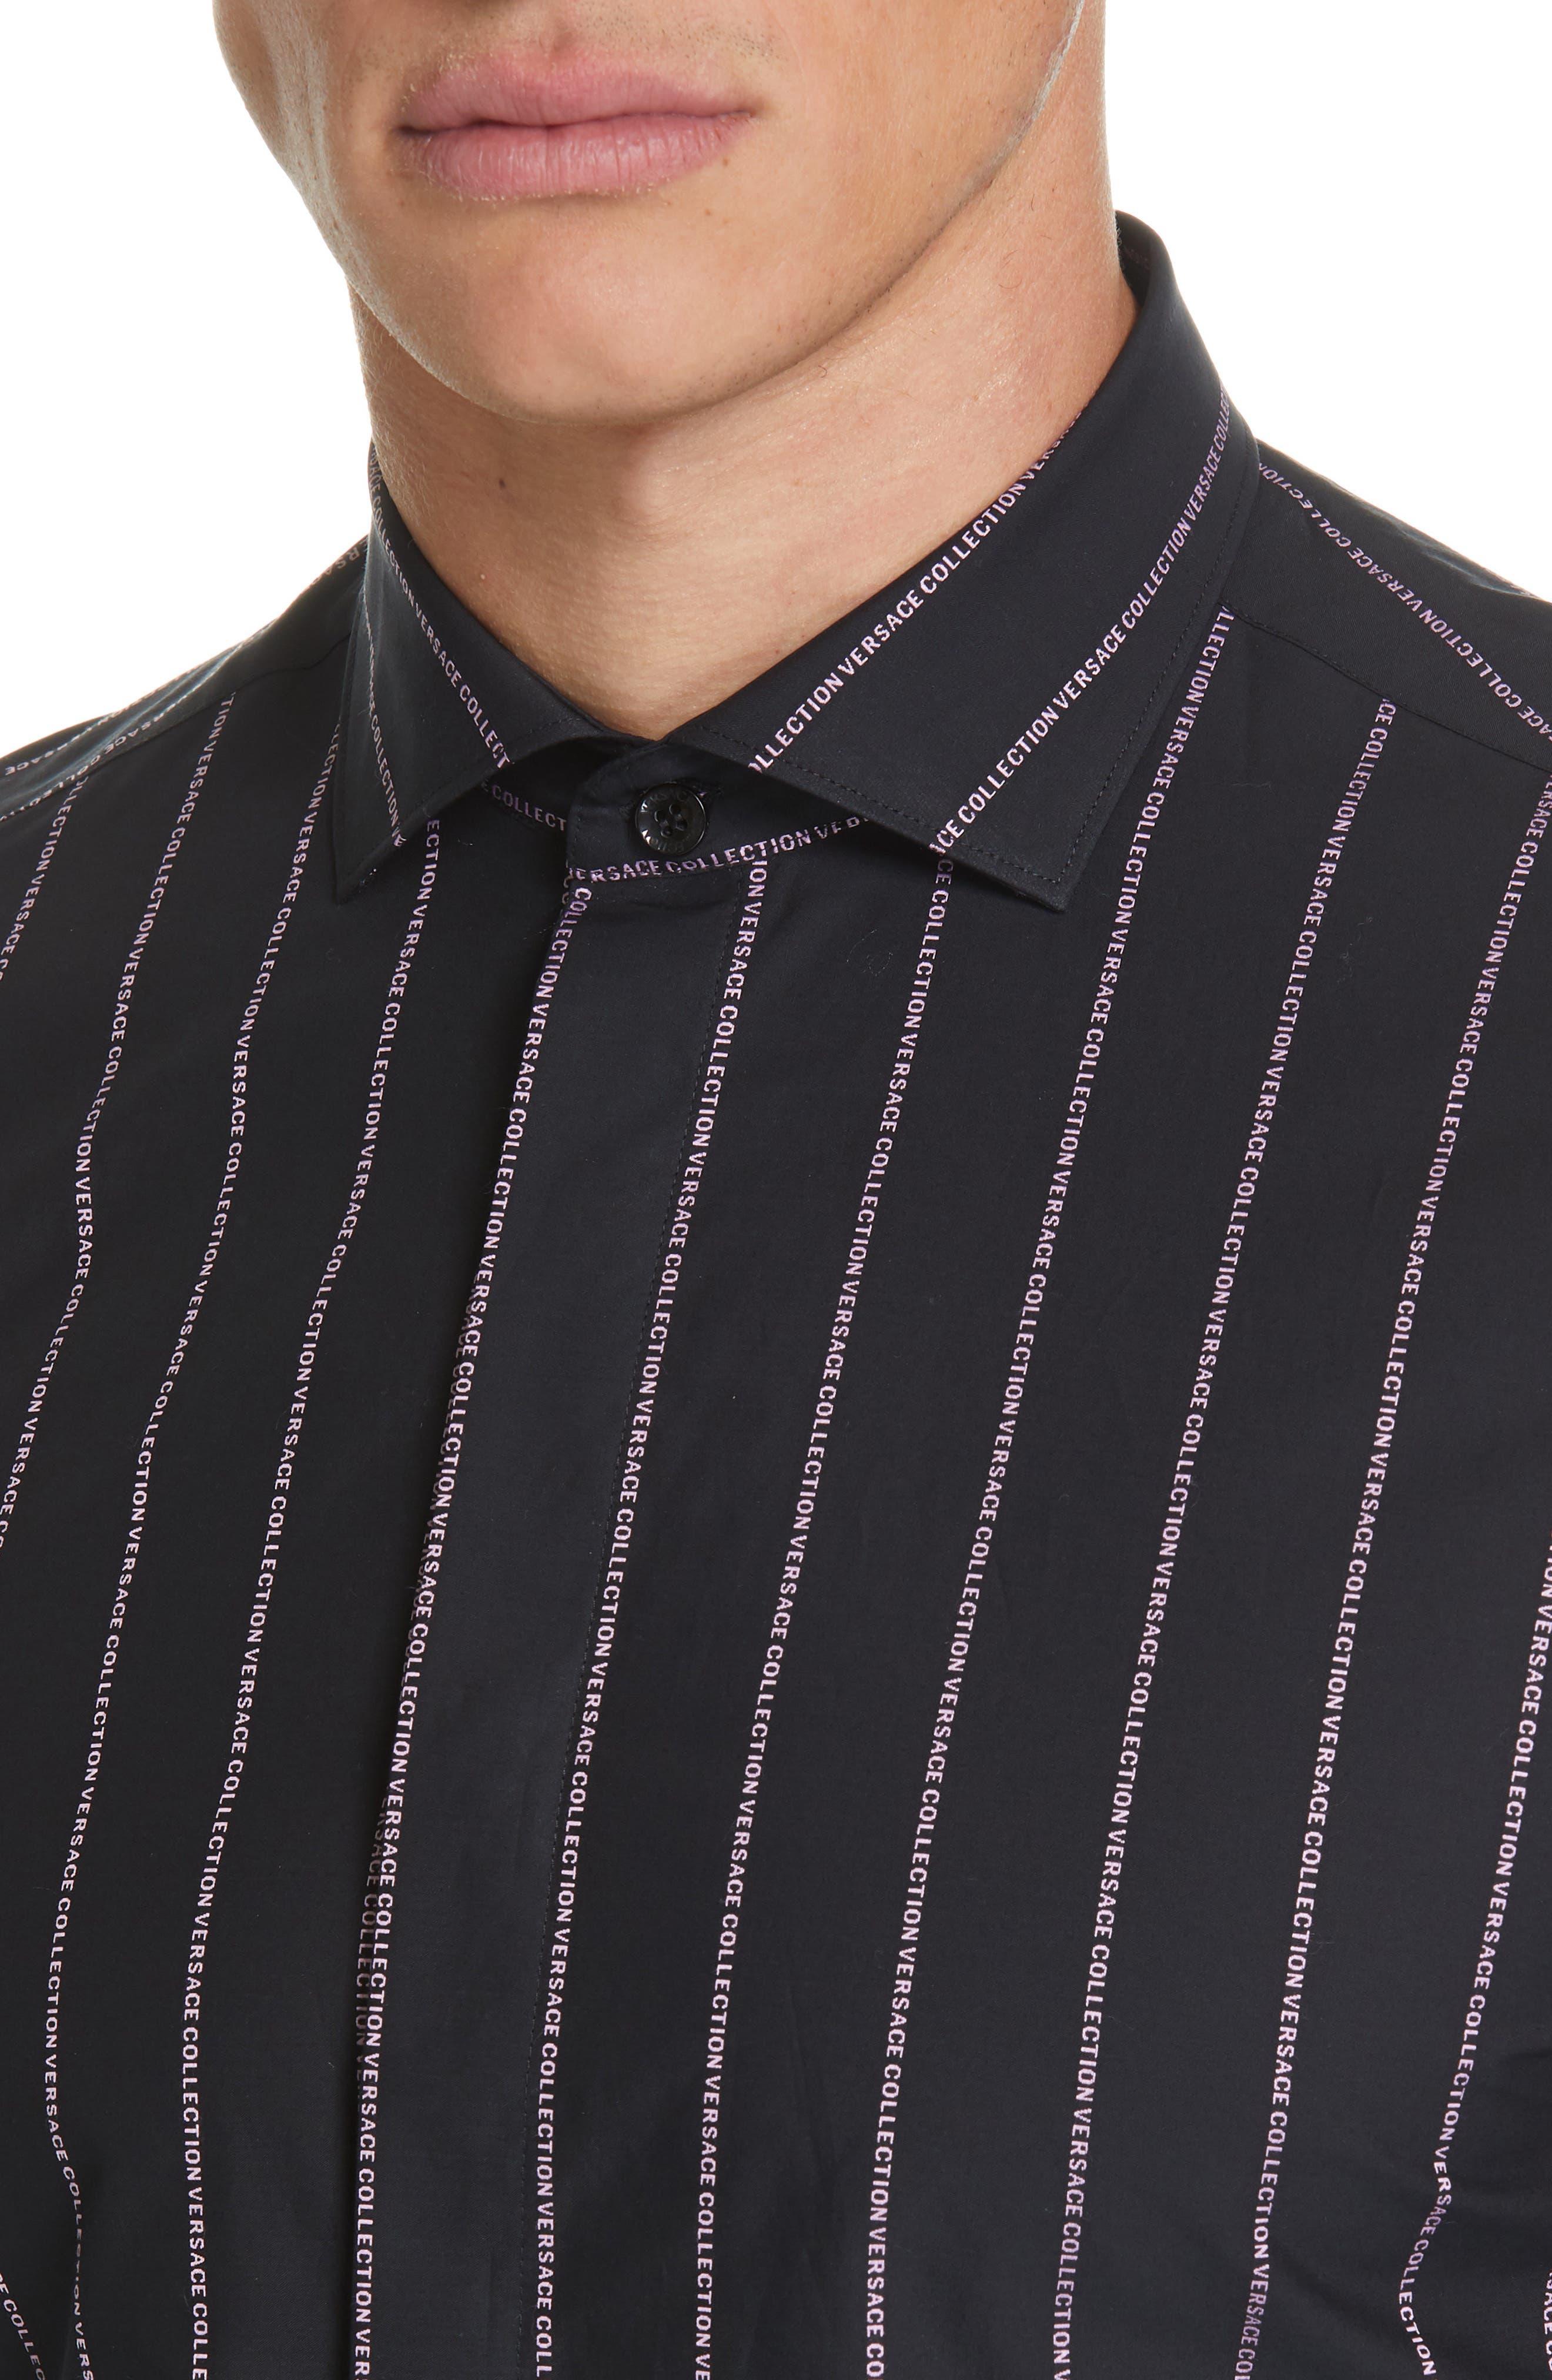 VERSACE COLLECTION, Logo Stripe Sport Shirt, Alternate thumbnail 2, color, BLACK/ PINK